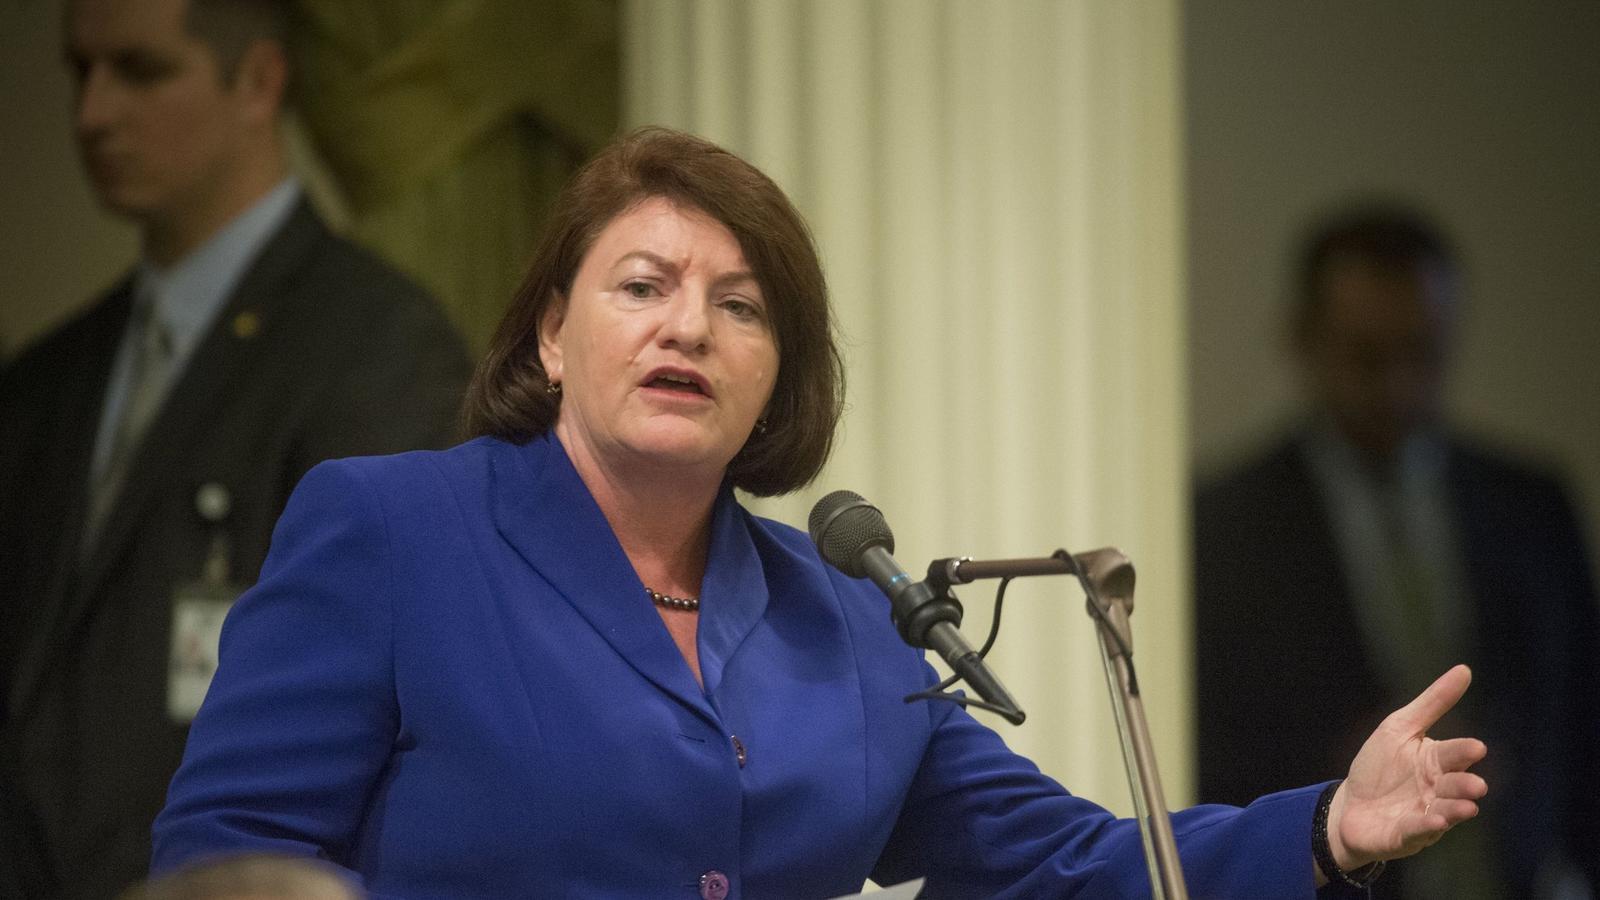 State Sen. Toni Atkins (D-San Diego) (Hector Amezcua / Associated Press)